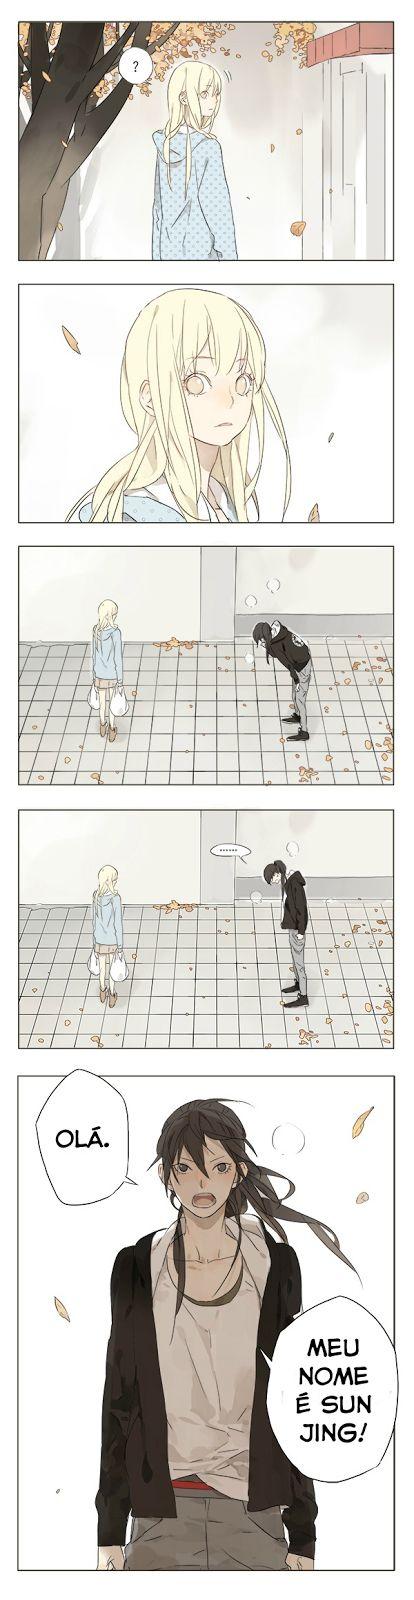 Armazém Yuri - Galeria de mangás: Tamen de Gushi - Capítulo 02